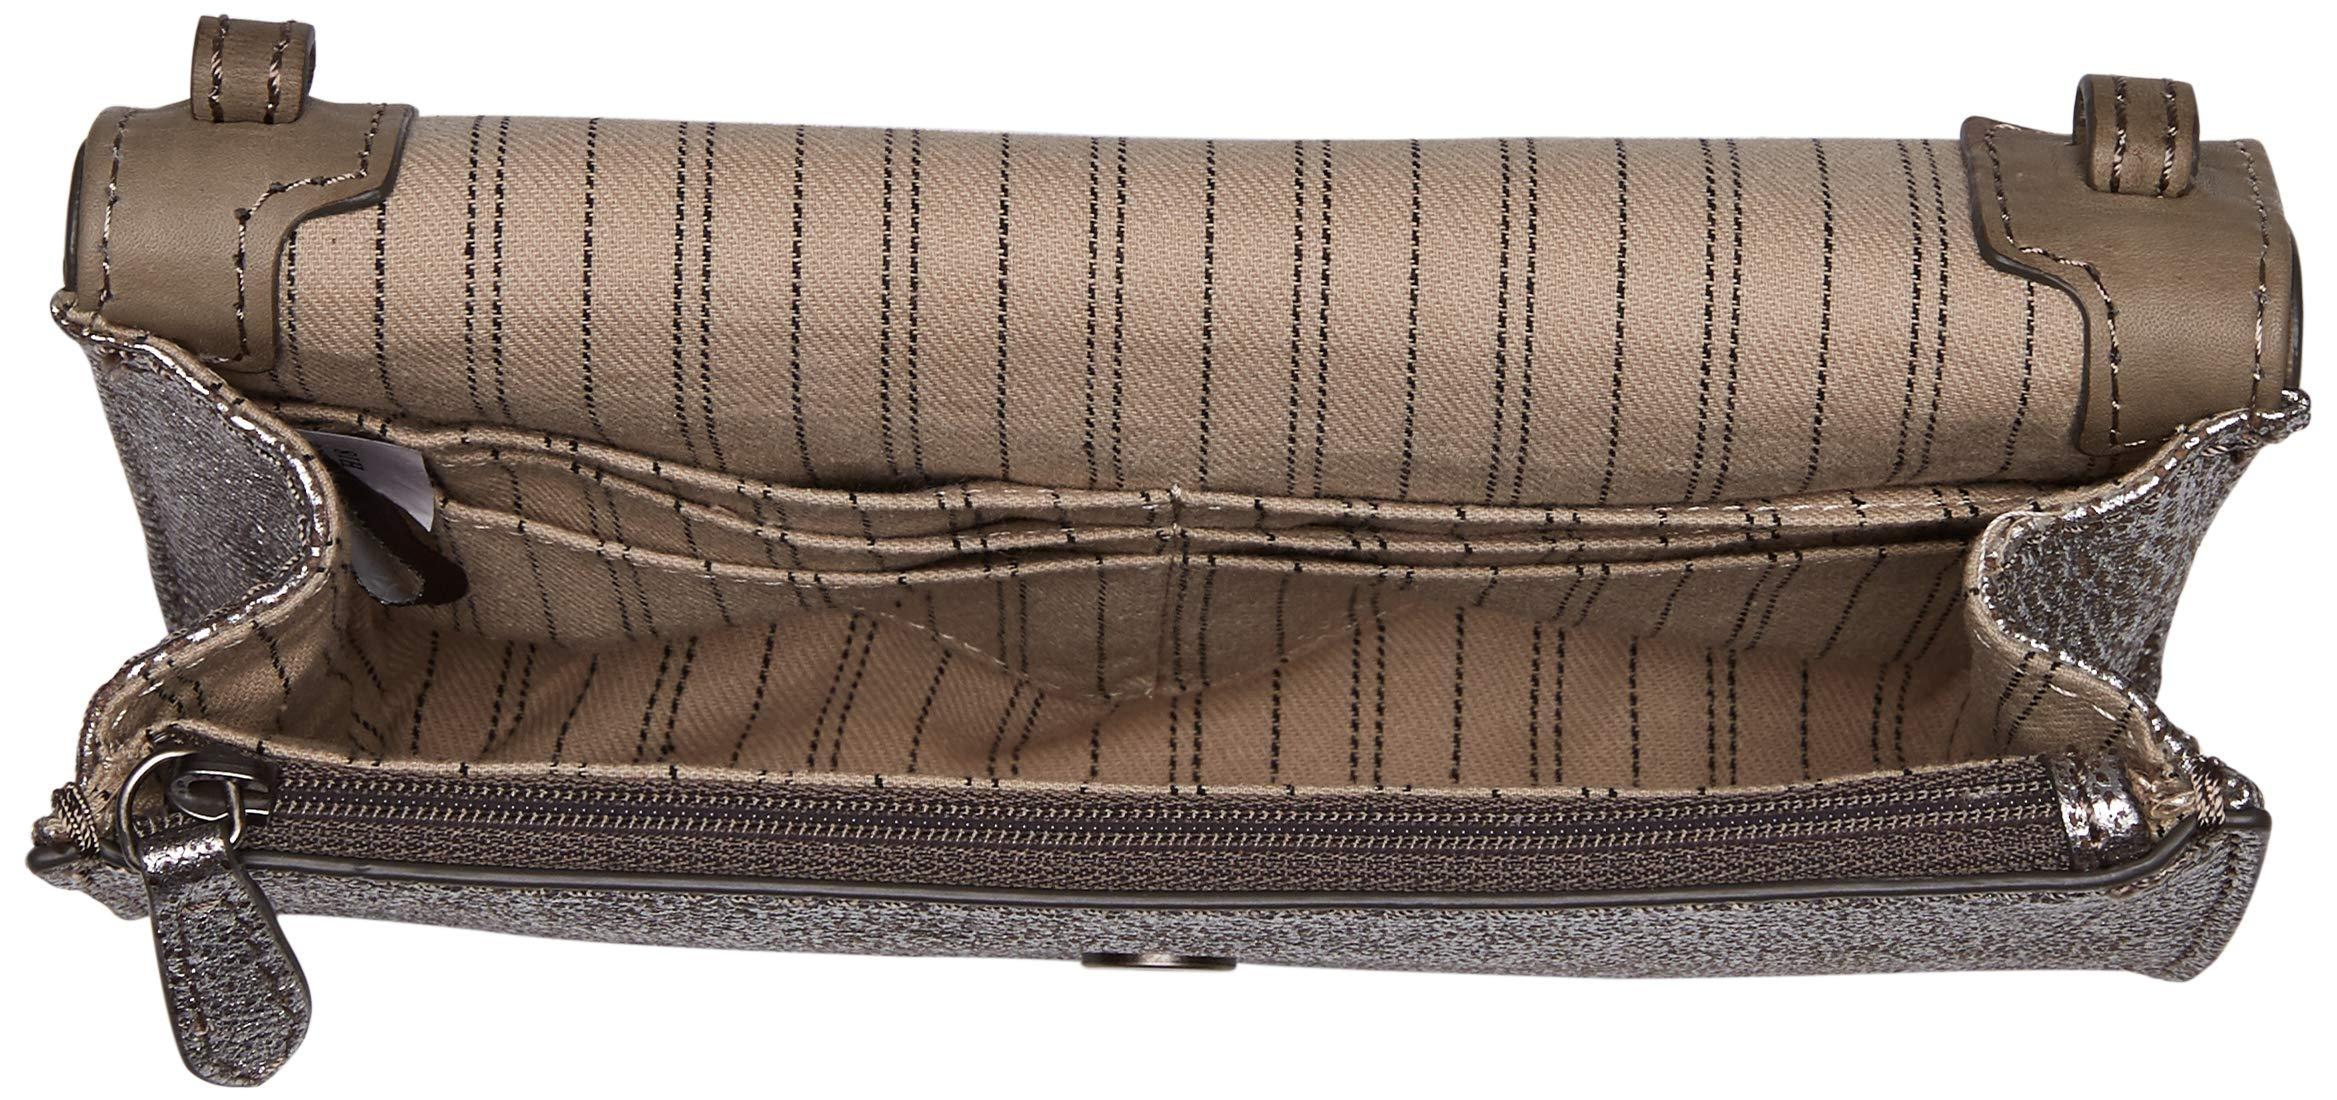 FRYE Melissa Wallet Crossbody Clutch Leather Bag, silver by FRYE (Image #5)